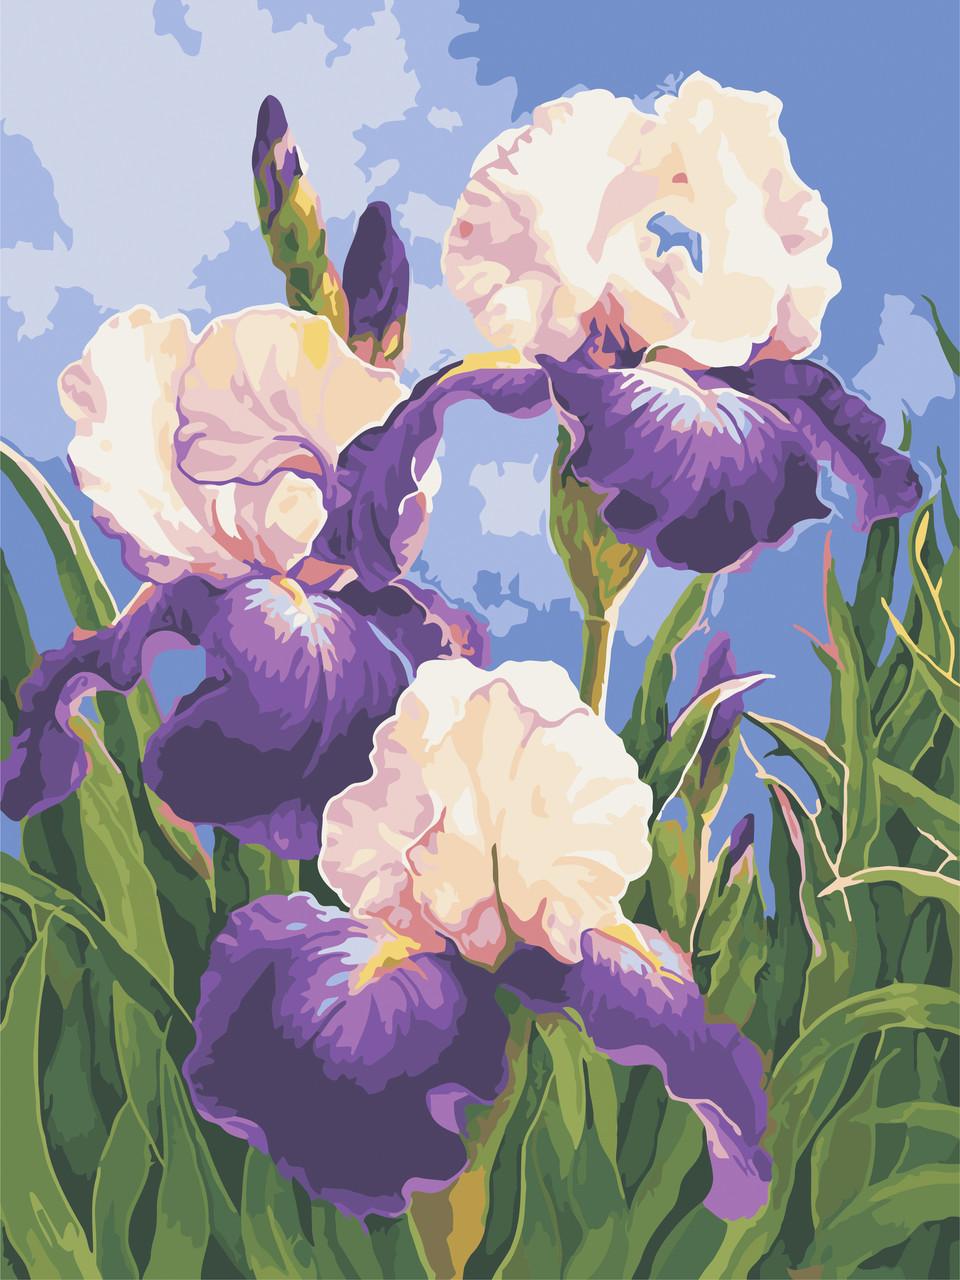 Набор живописи по номерам Весенние ирисы ArtStory AS0592 30 х 40 см (без коробки)